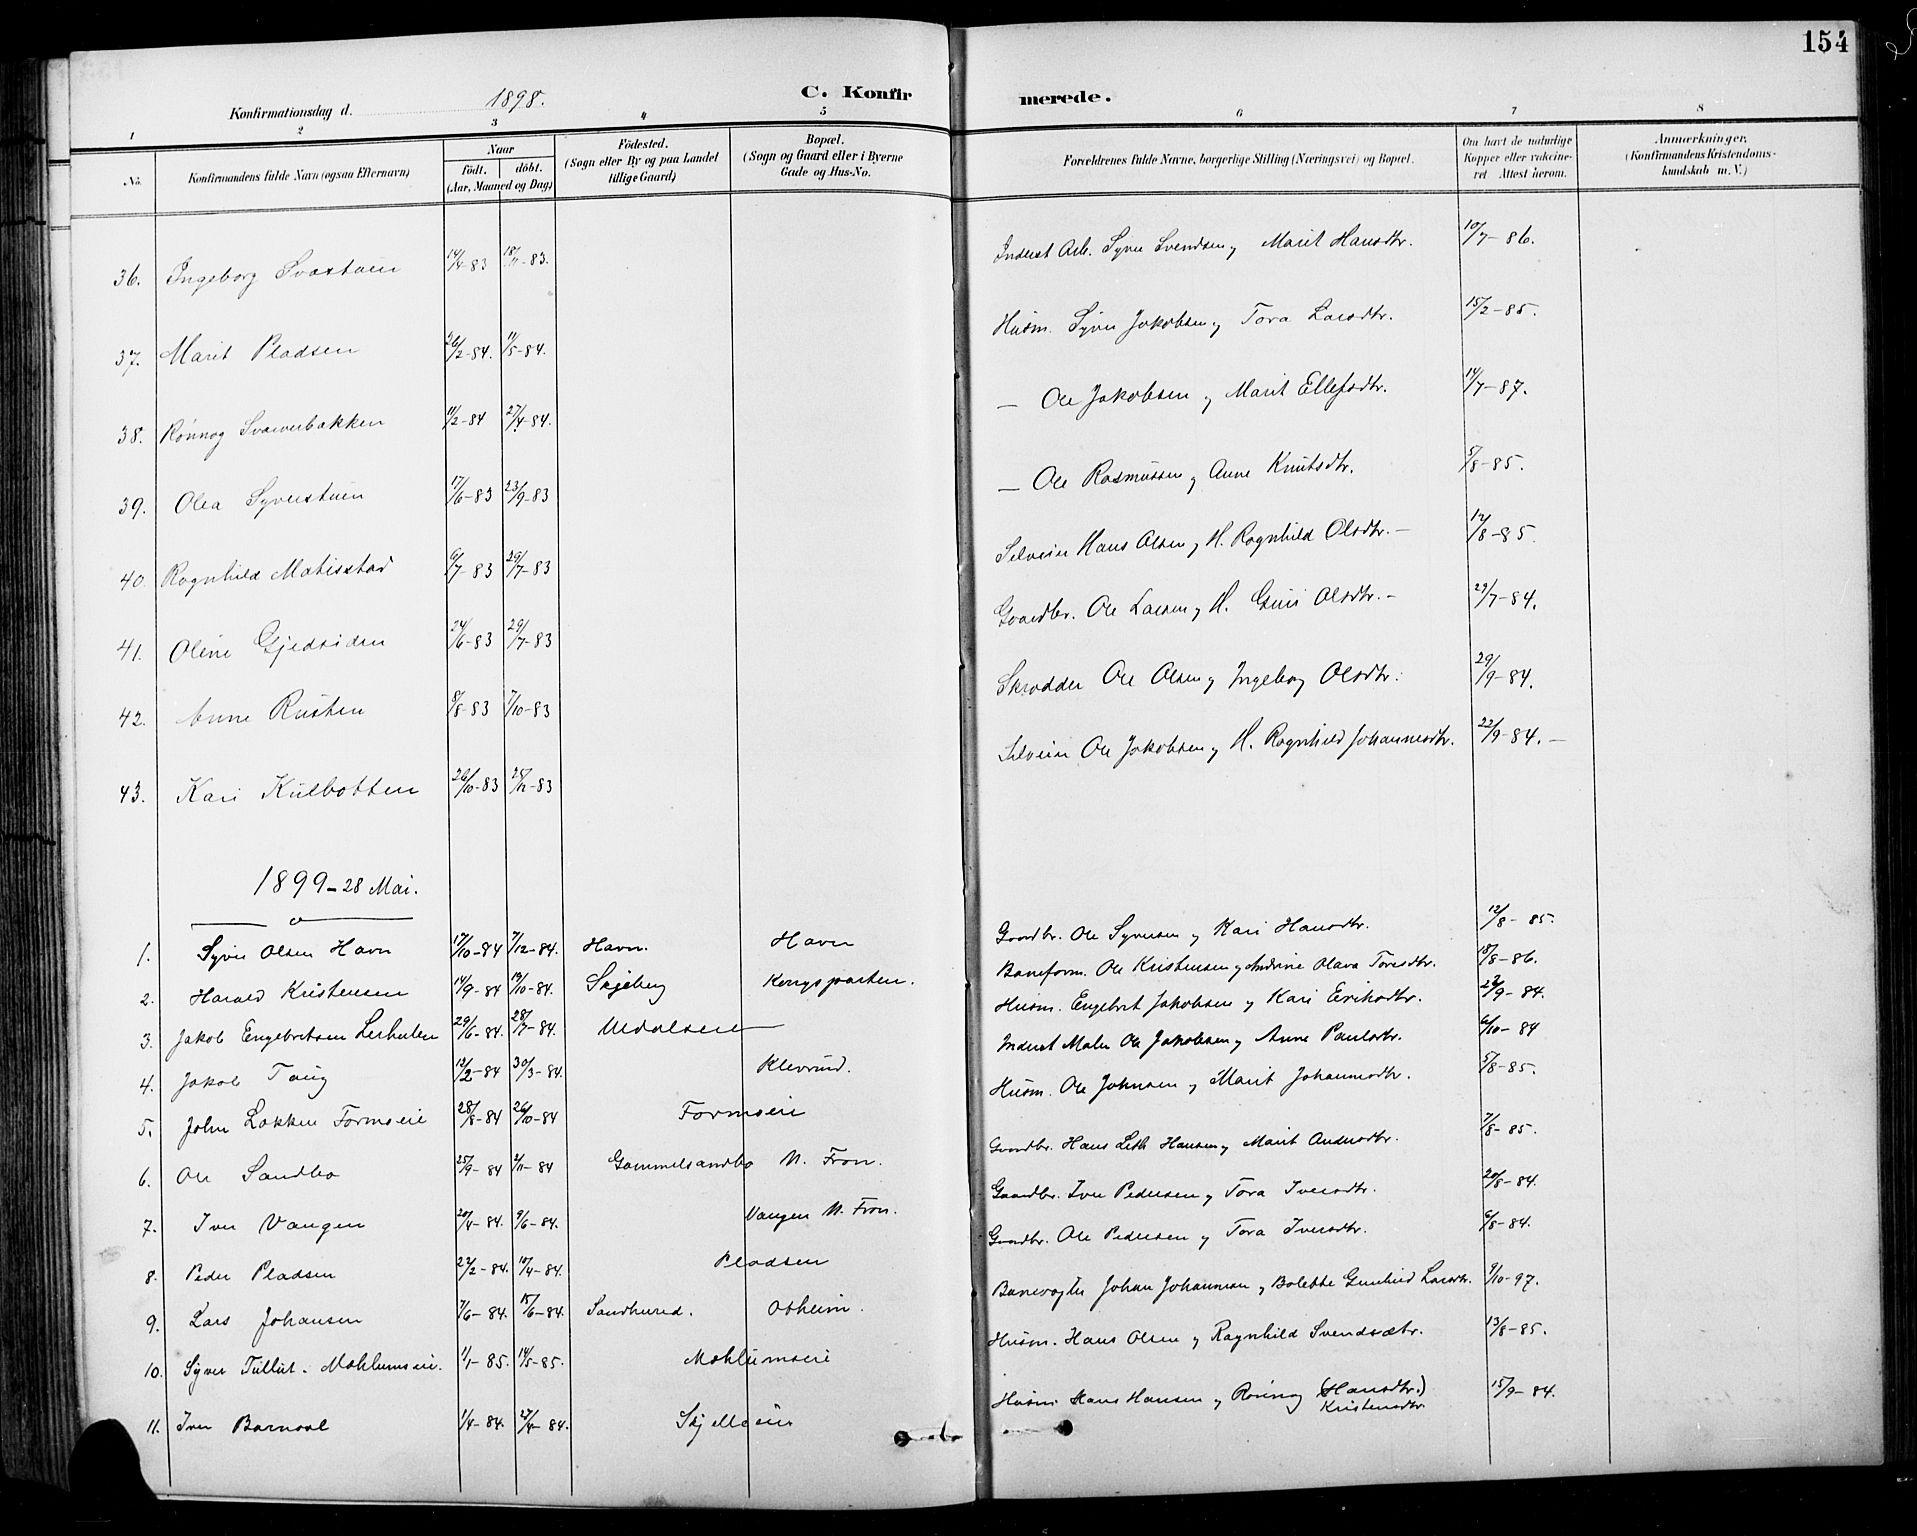 SAH, Sel prestekontor, Klokkerbok nr. 1, 1894-1923, s. 154